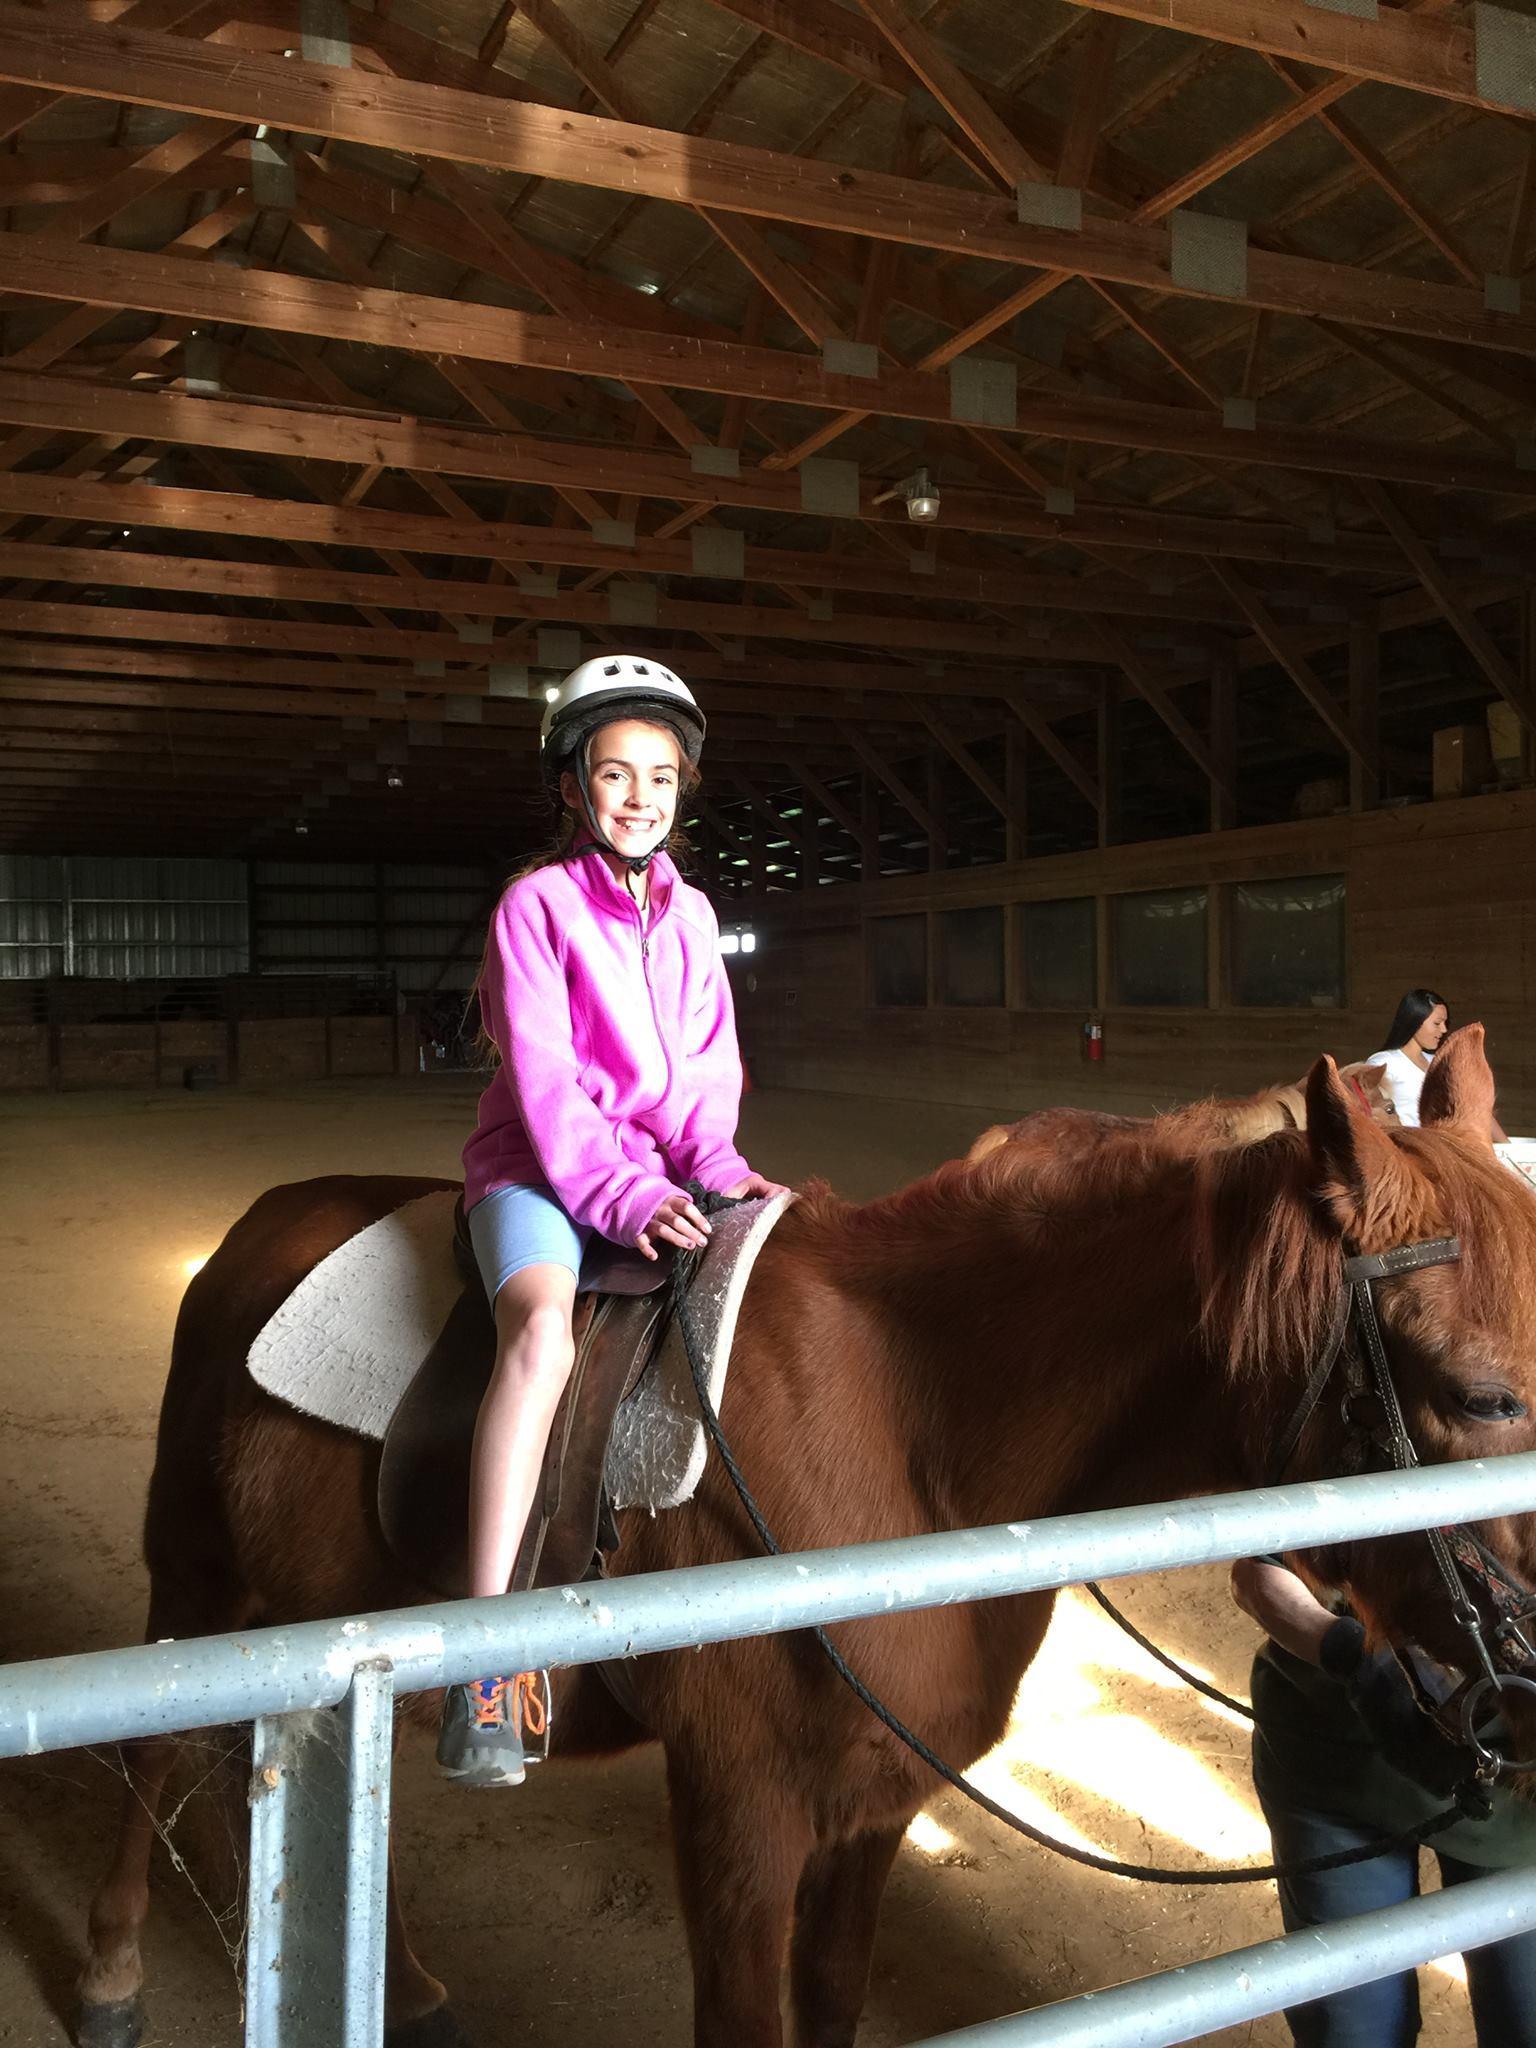 Wright-Way Equestrian Center Inc. image 6